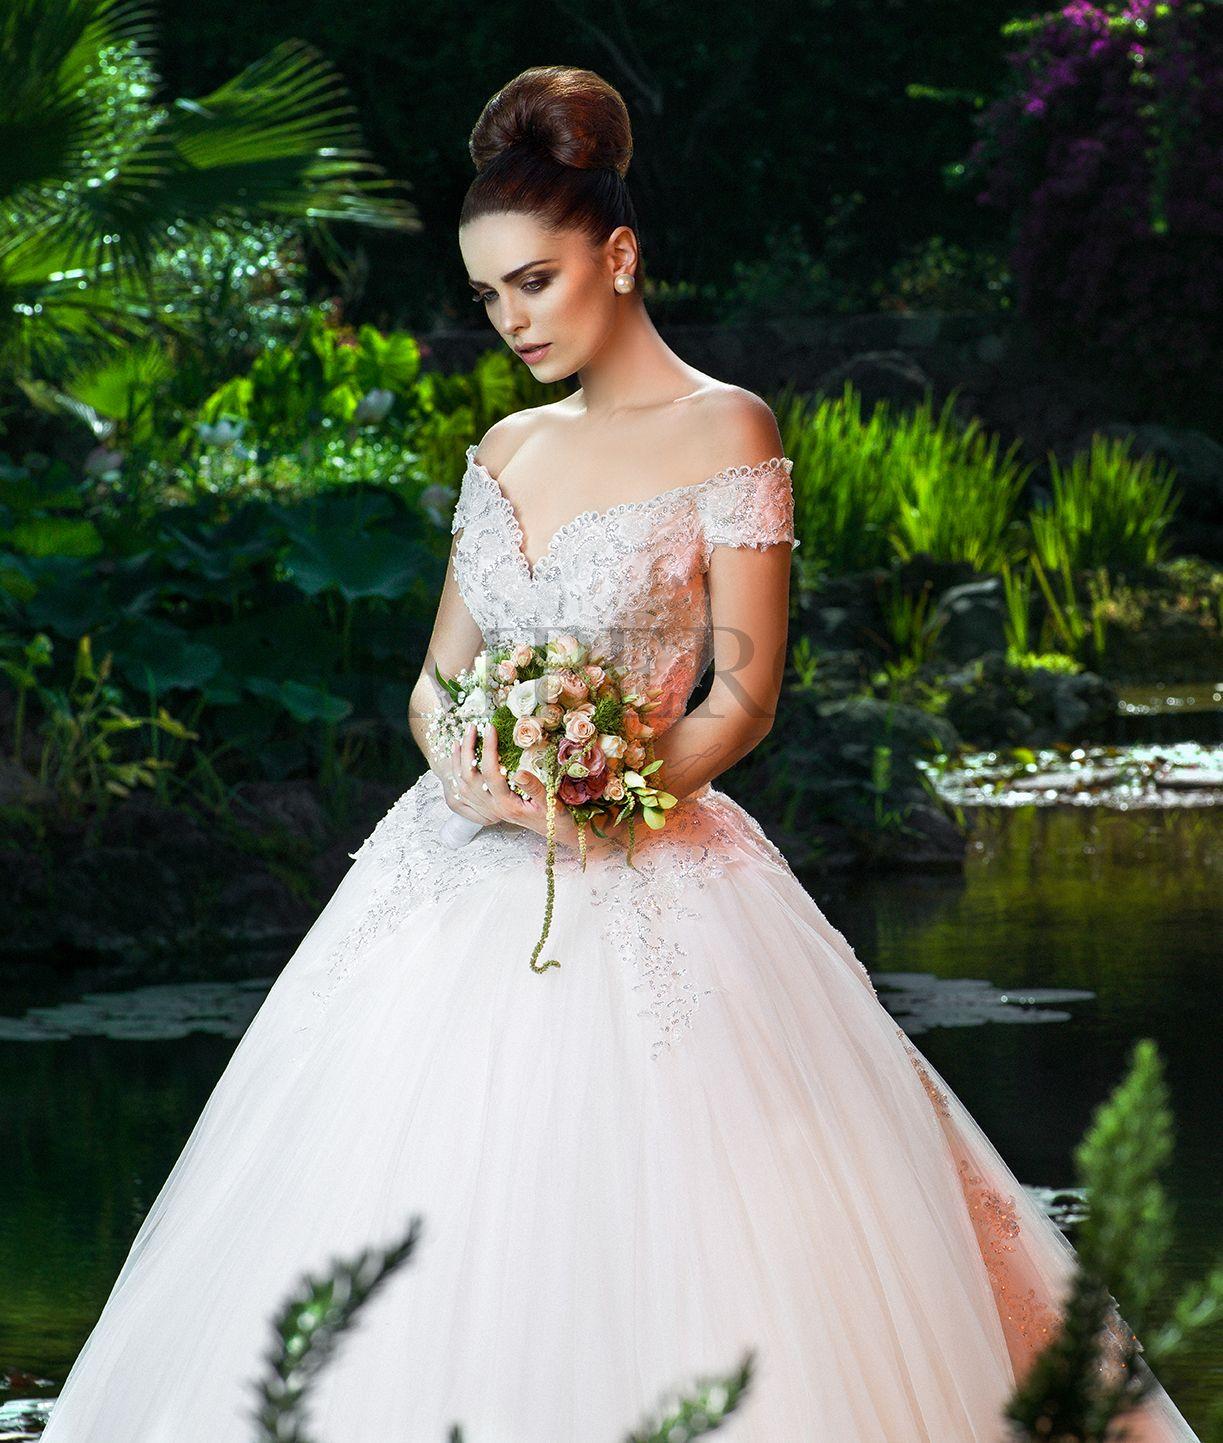 CHIARA 2  #sposa #abiti #dress #bride #bridal #wedding #2017 #impero #matrimonio #nozze